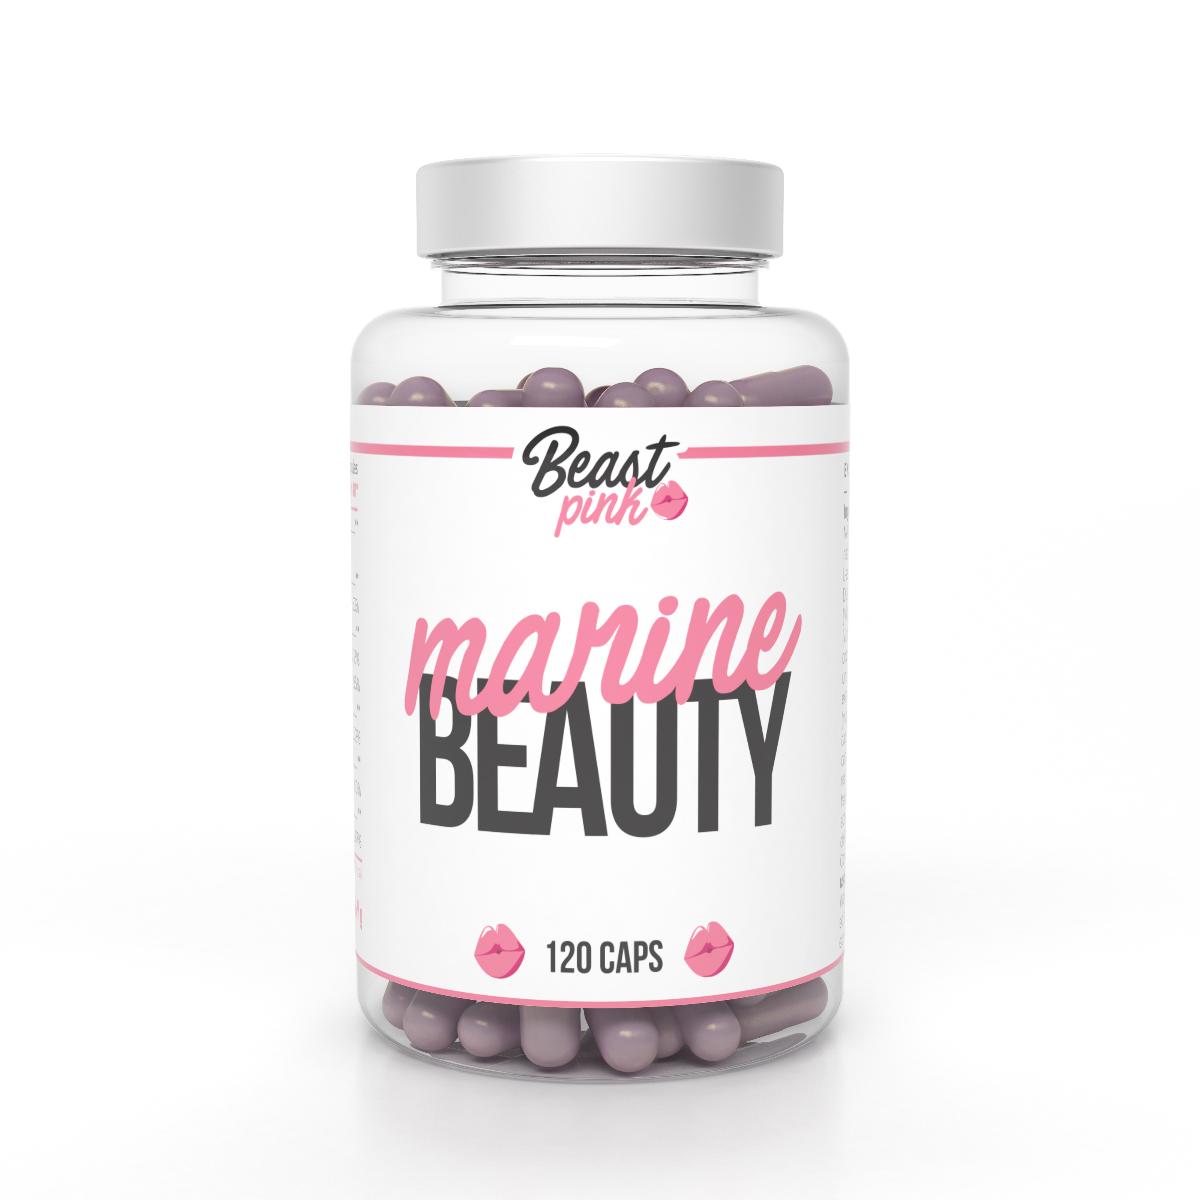 Marine Beauty 120 kaps. - BeastPink